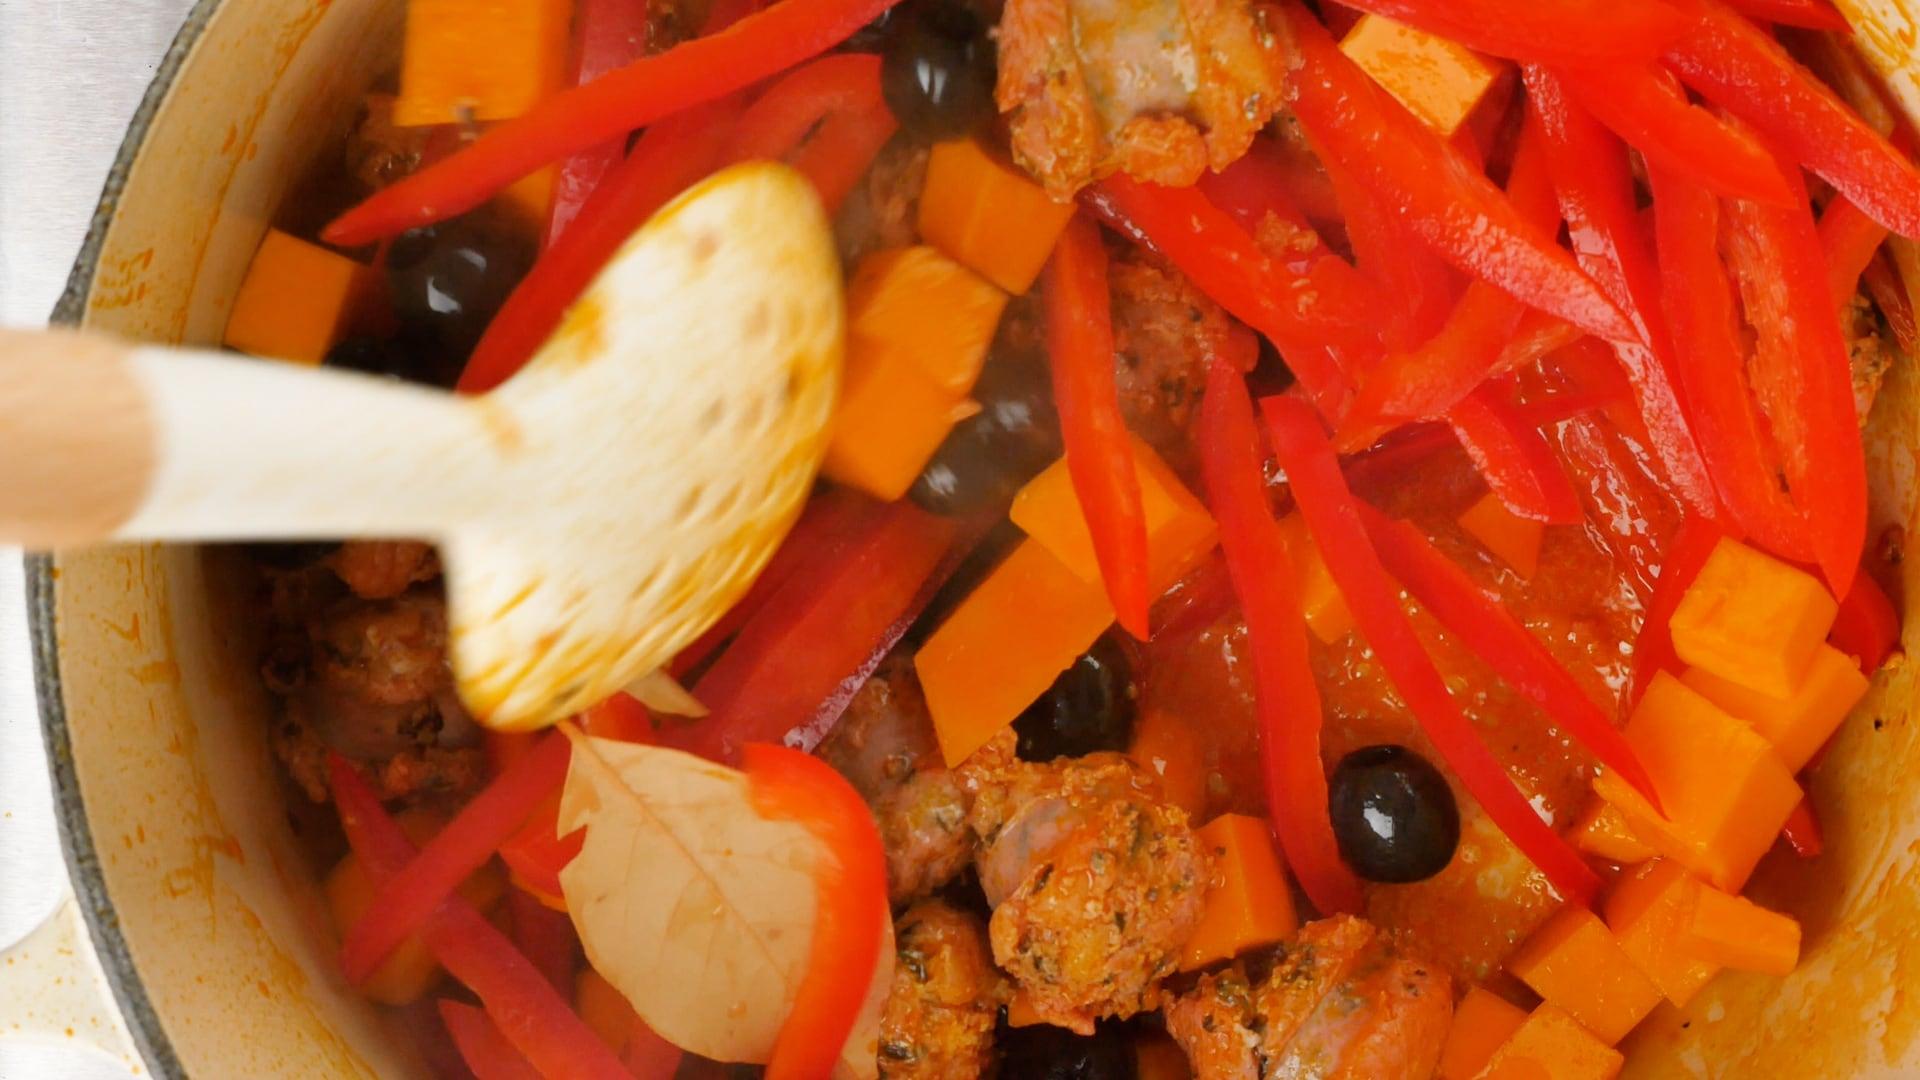 Stirring vegetables